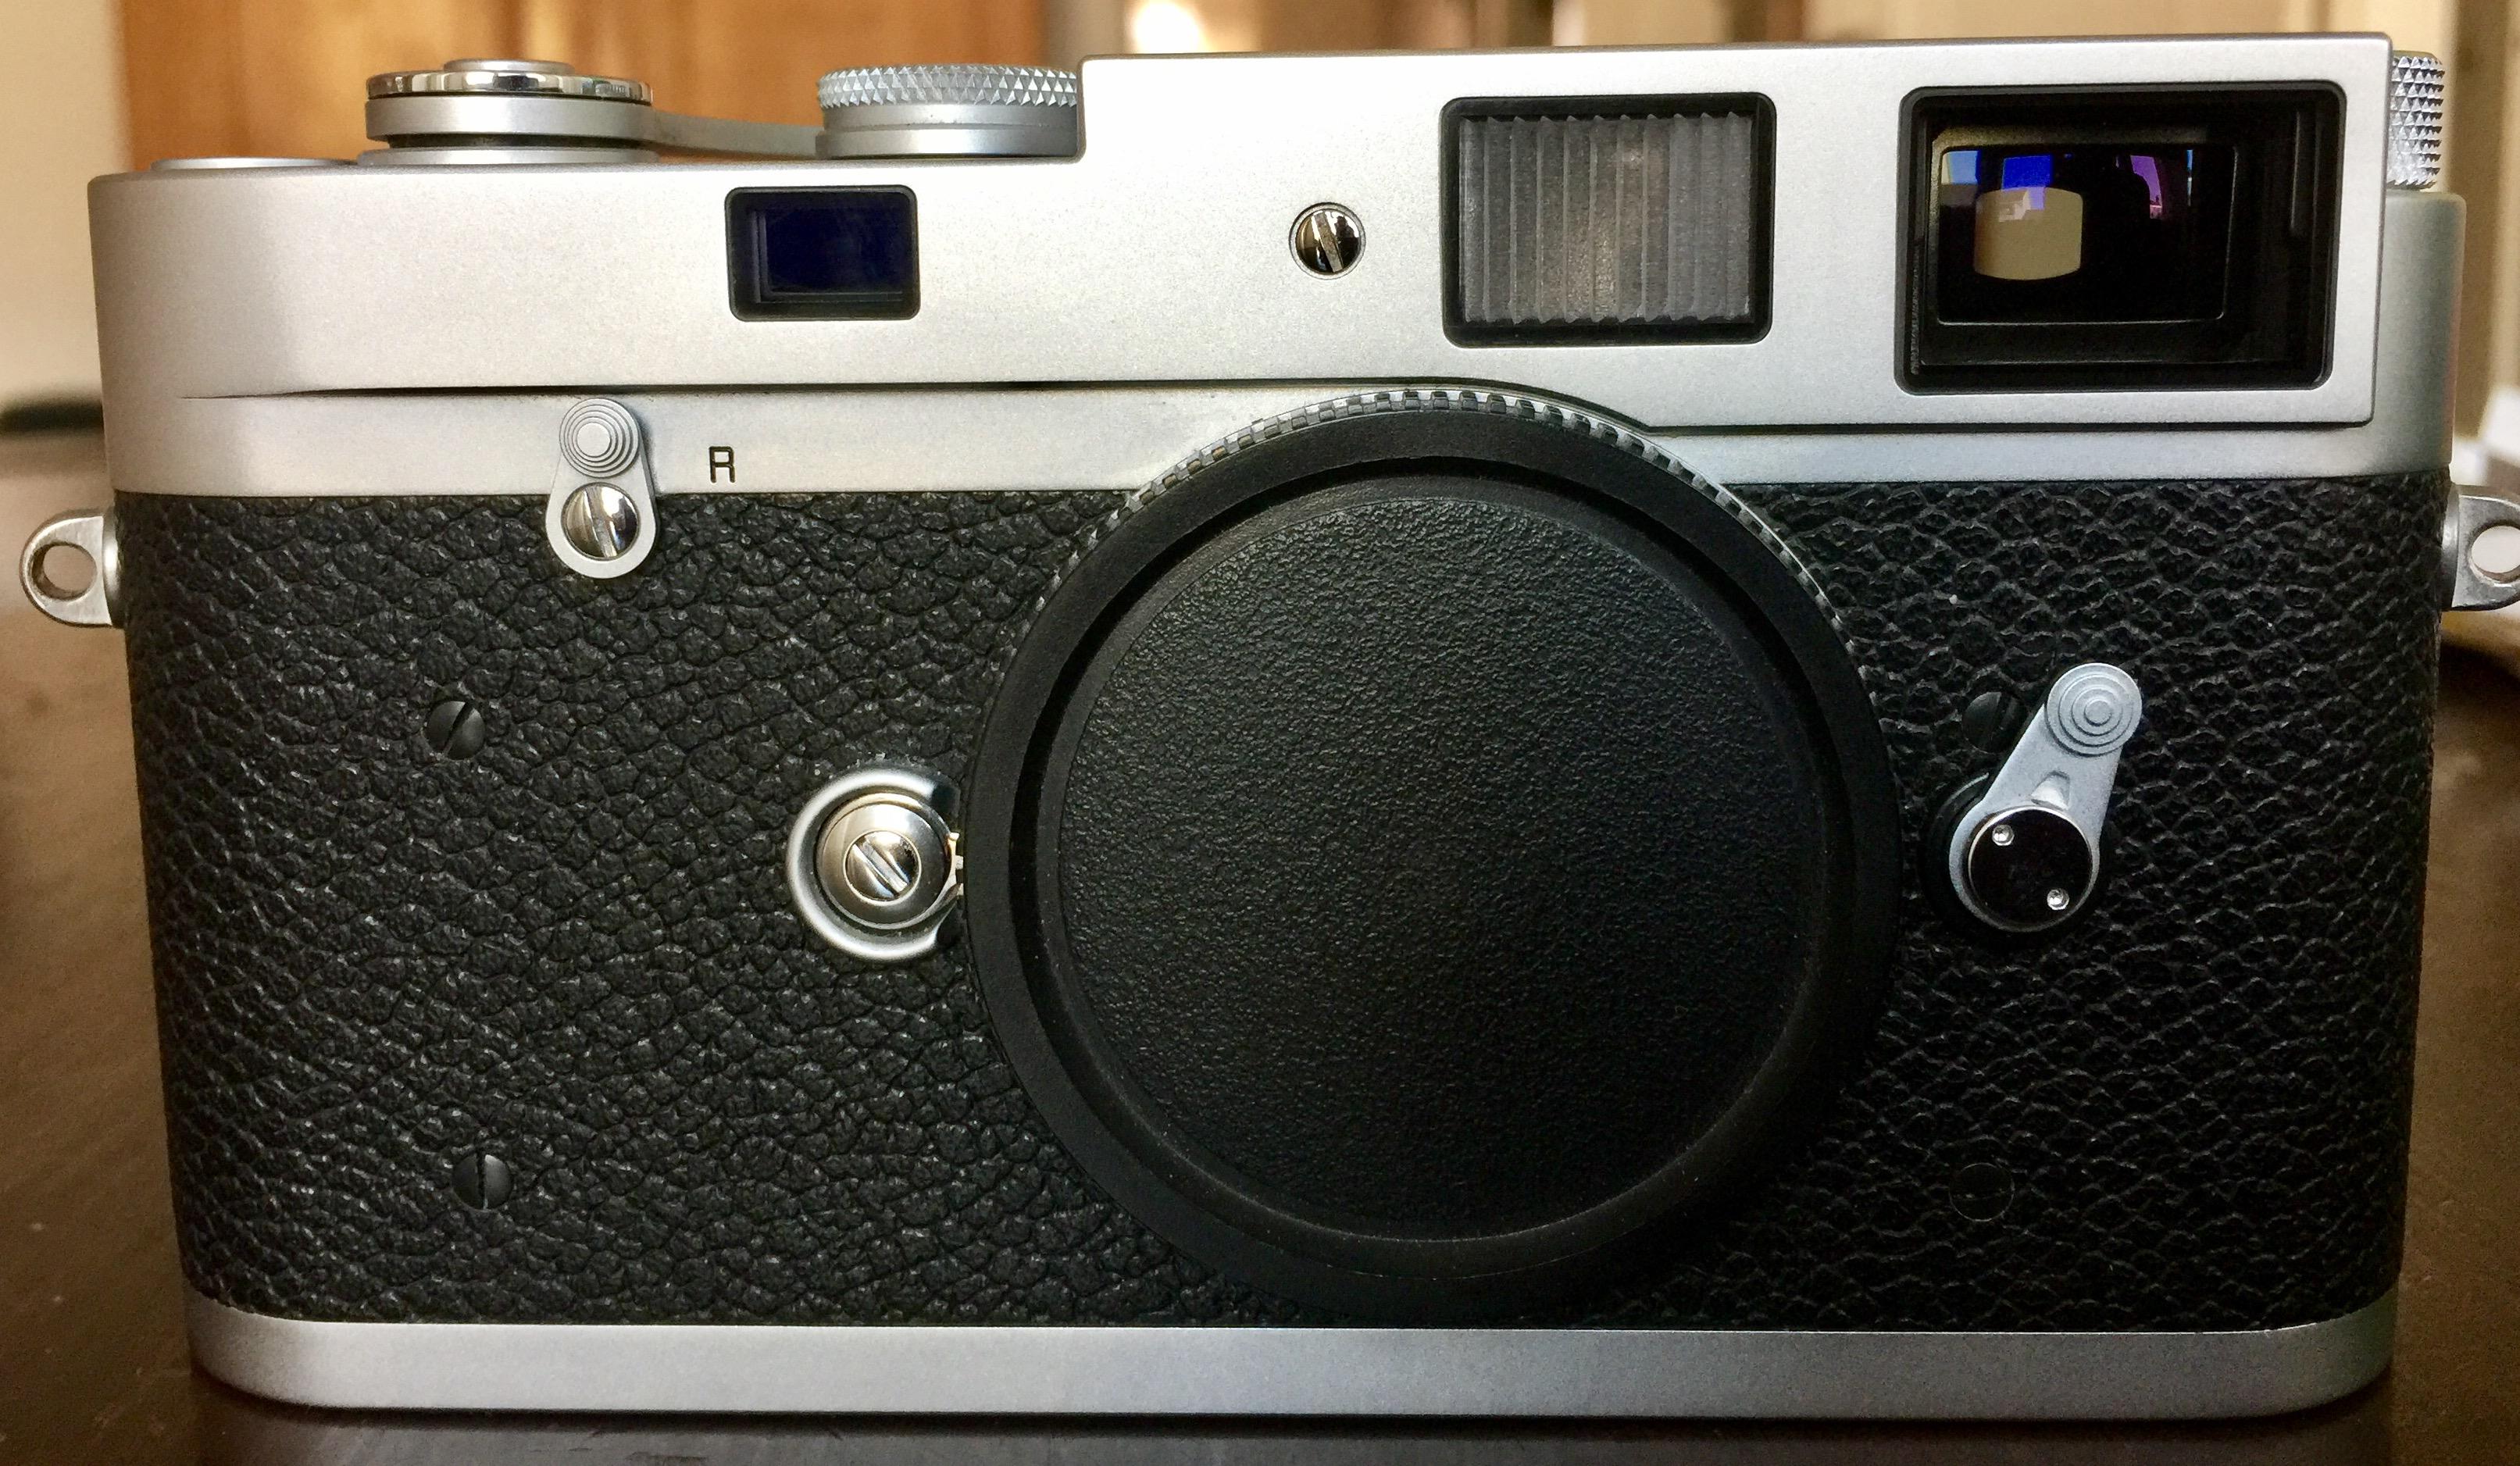 Ott Wyss Ag Fototechnik Tetherpro Usb C To 30 Micro B Cable Cuc3315 46 Neuwertige Leica M A Typ 127 Silber Zu Verkaufen